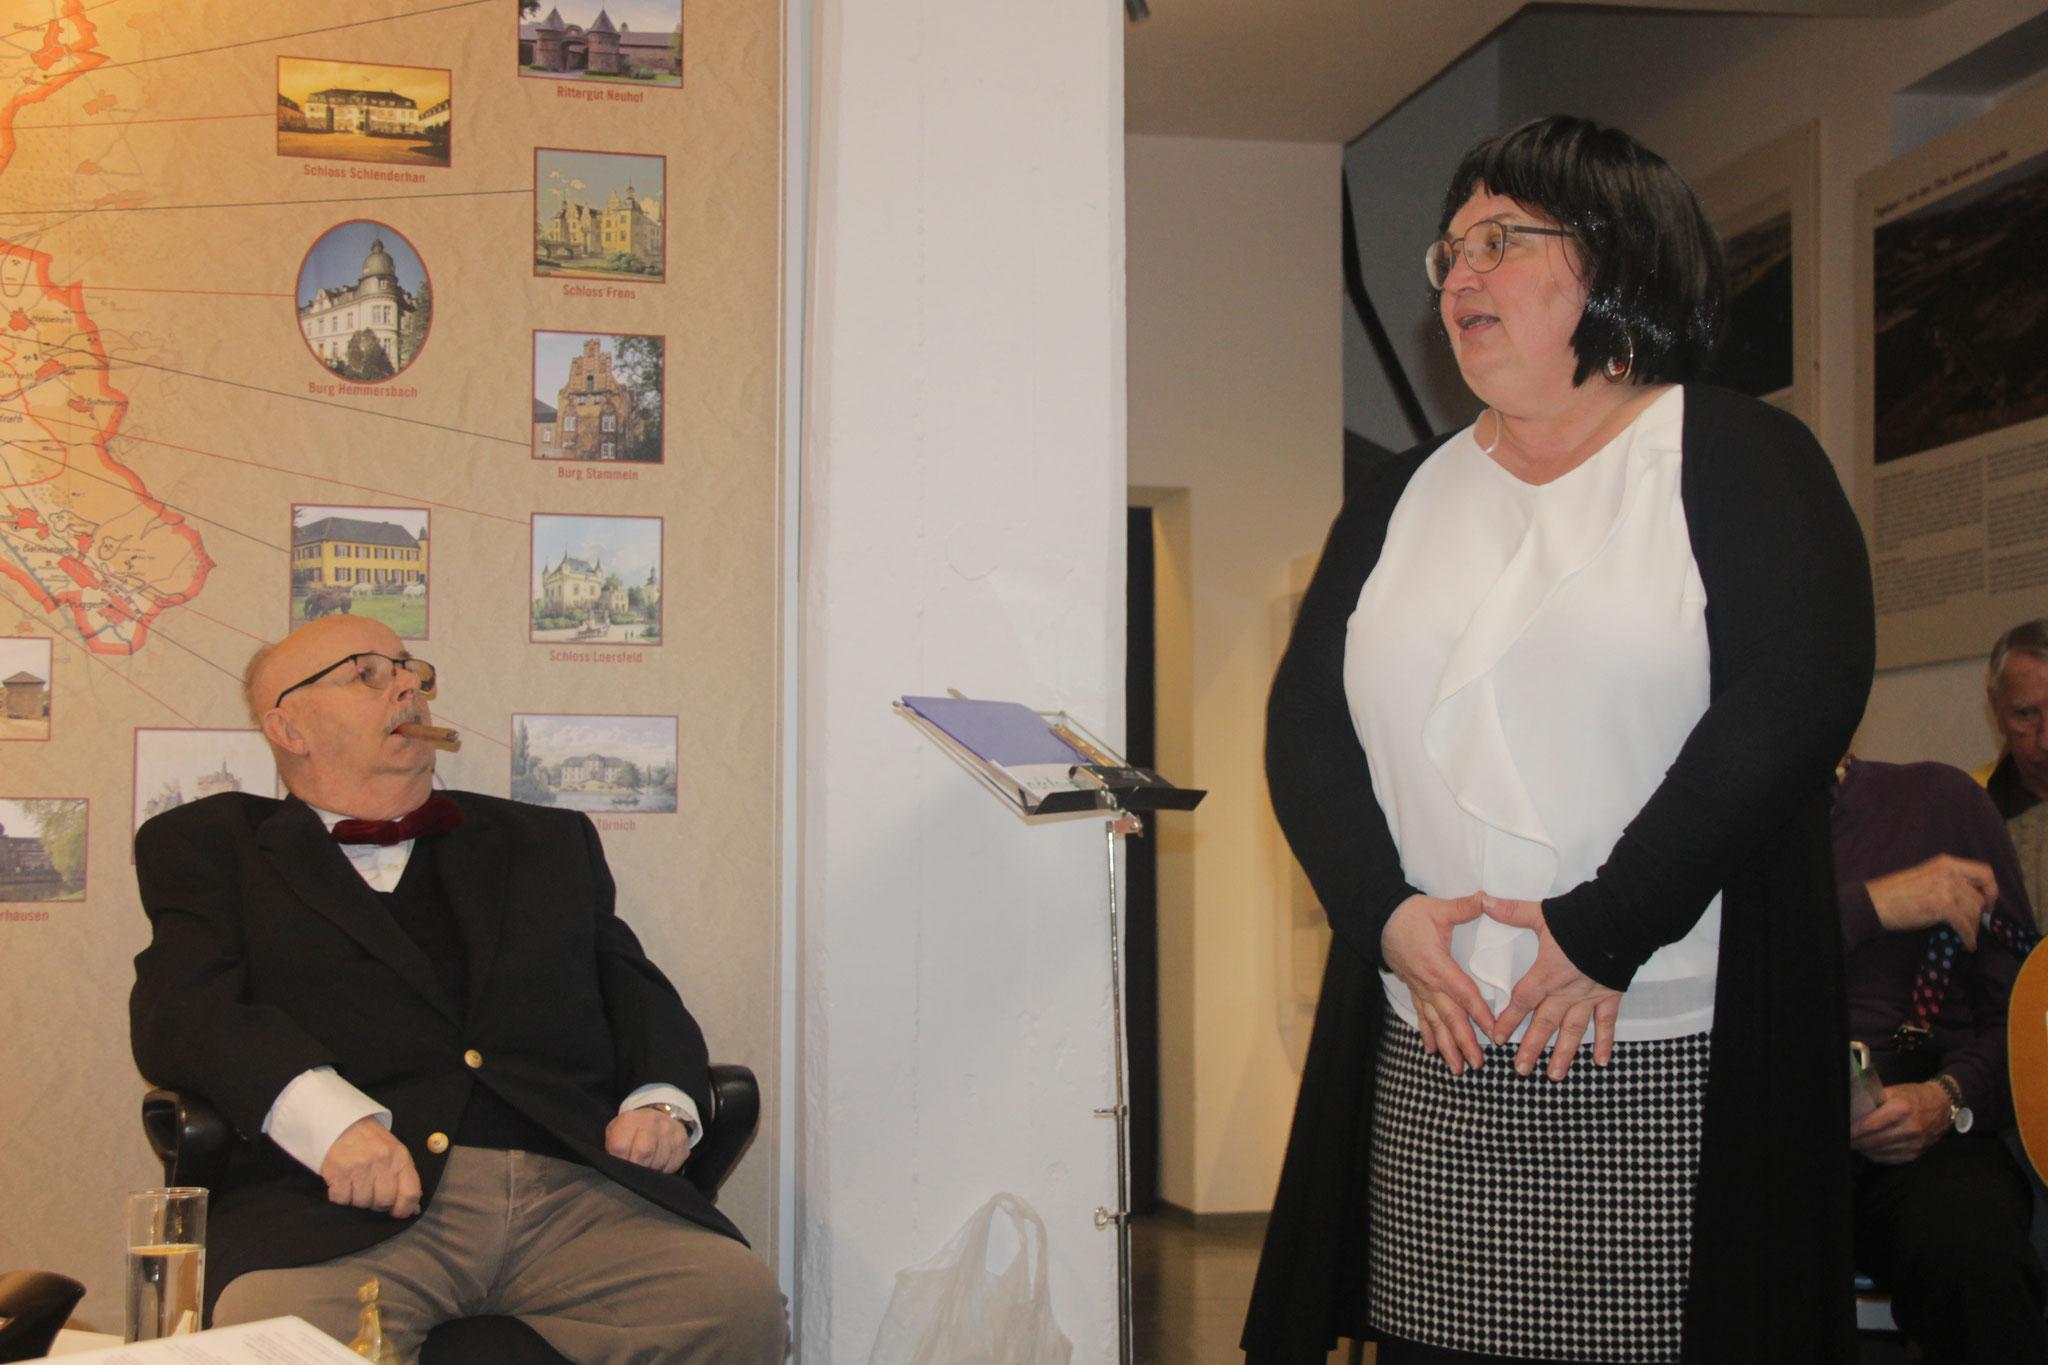 Herr Genarldirektor Mr. Miller (Werner Kremer) und Frau Dr. Elfriede Rubienstein (Astrid Machuj)